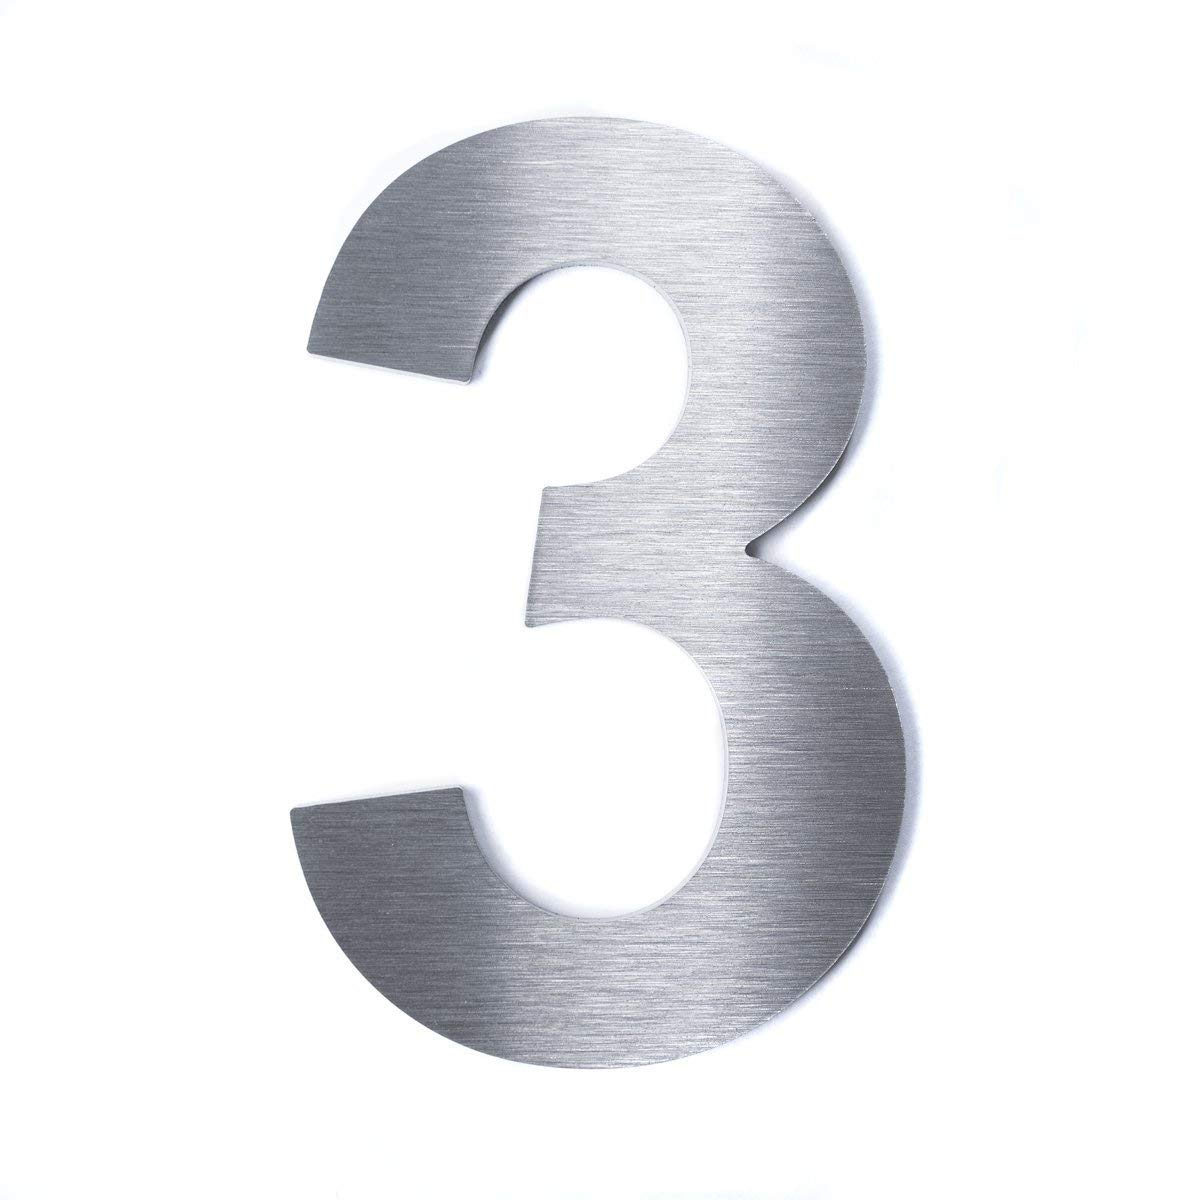 Hochwertige Edelstahl V2A HausnummerKlassisch grob geschliffen massiv /& rostfrei H/öhe 2mm 9 140mm Materialst/ärke